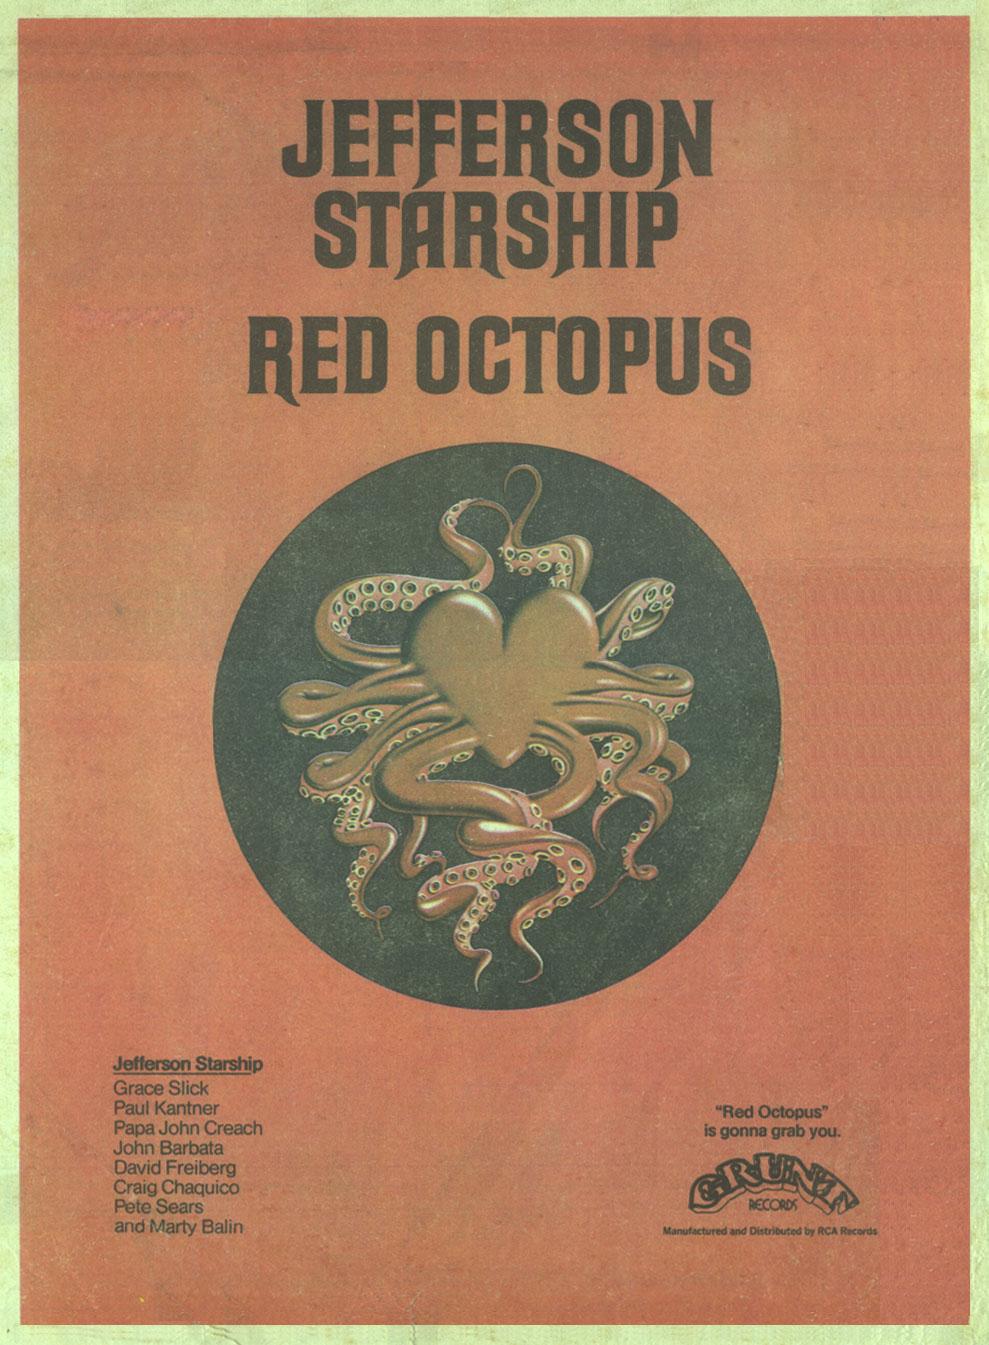 Jefferson Starship Red Octopus